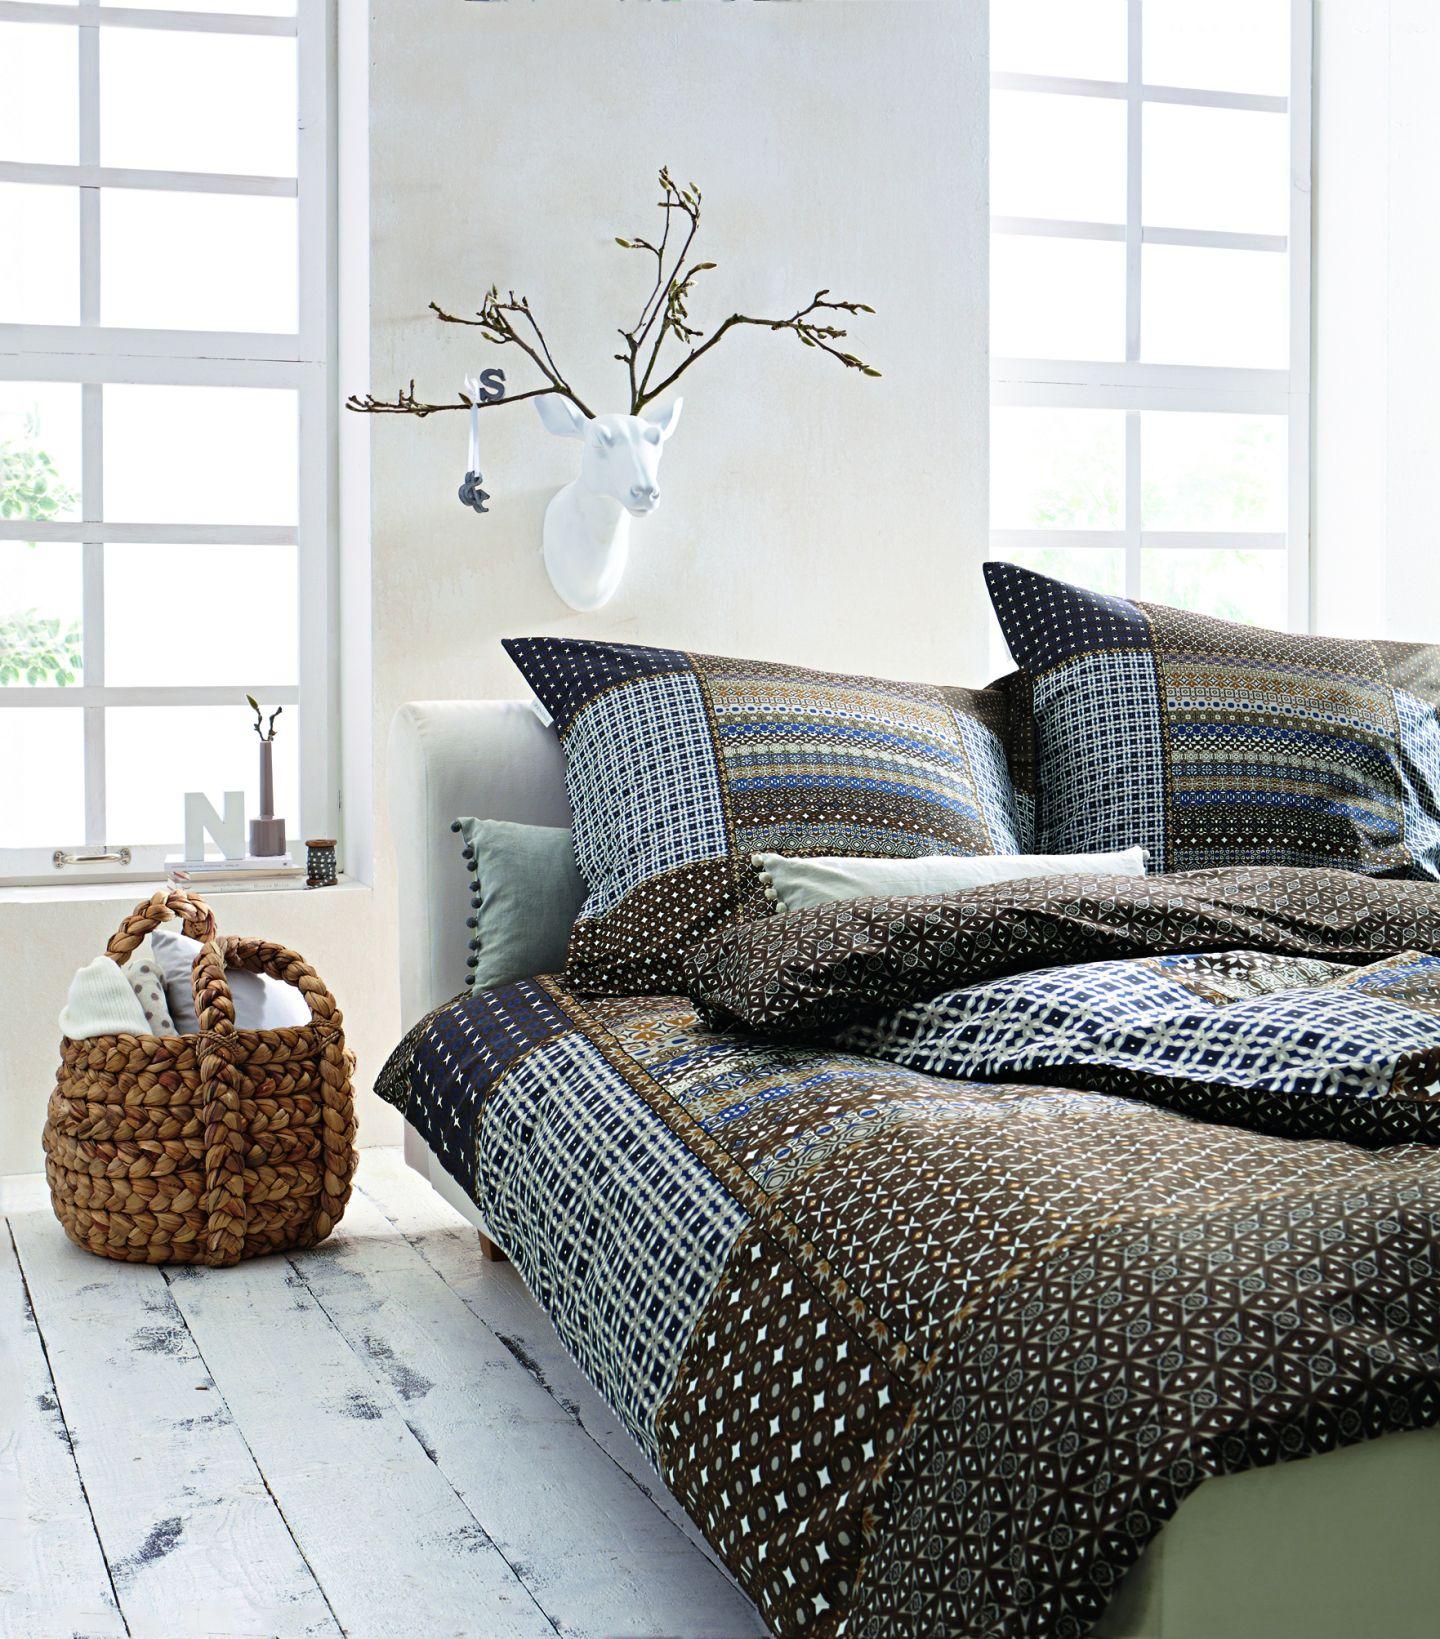 ausgefallene accessoires f rs schlafzimmer. Black Bedroom Furniture Sets. Home Design Ideas